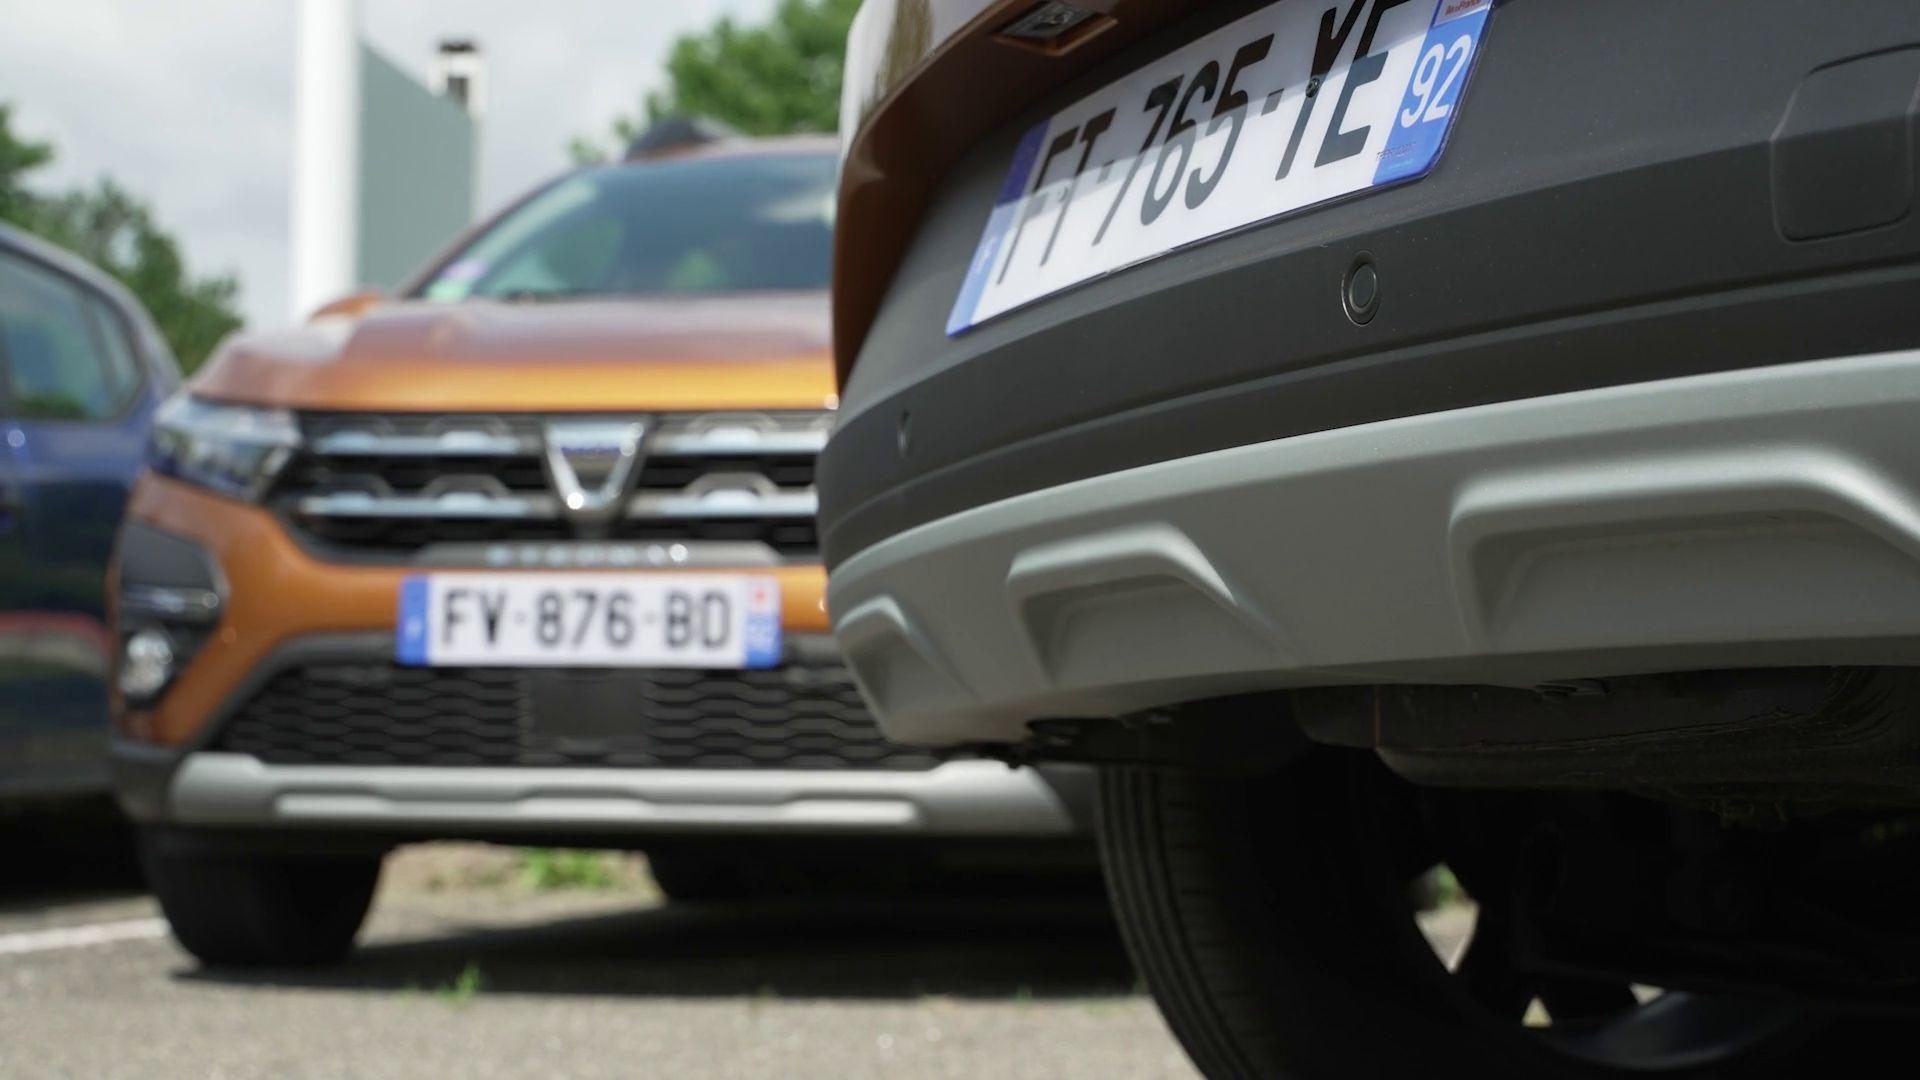 Dacia ima tajno oružje protiv ogrebotina!